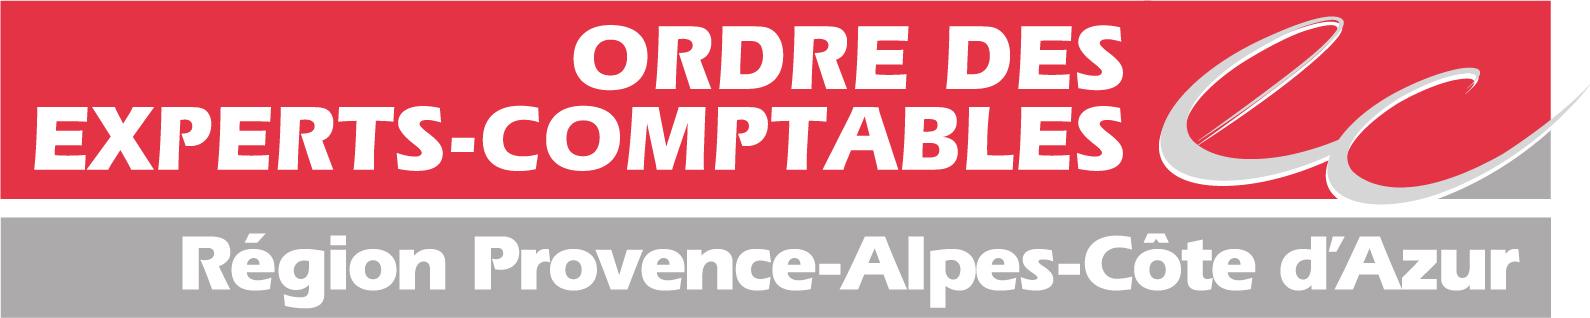 OEC-Région-ProvenceAlpesCotesdAzur_2019